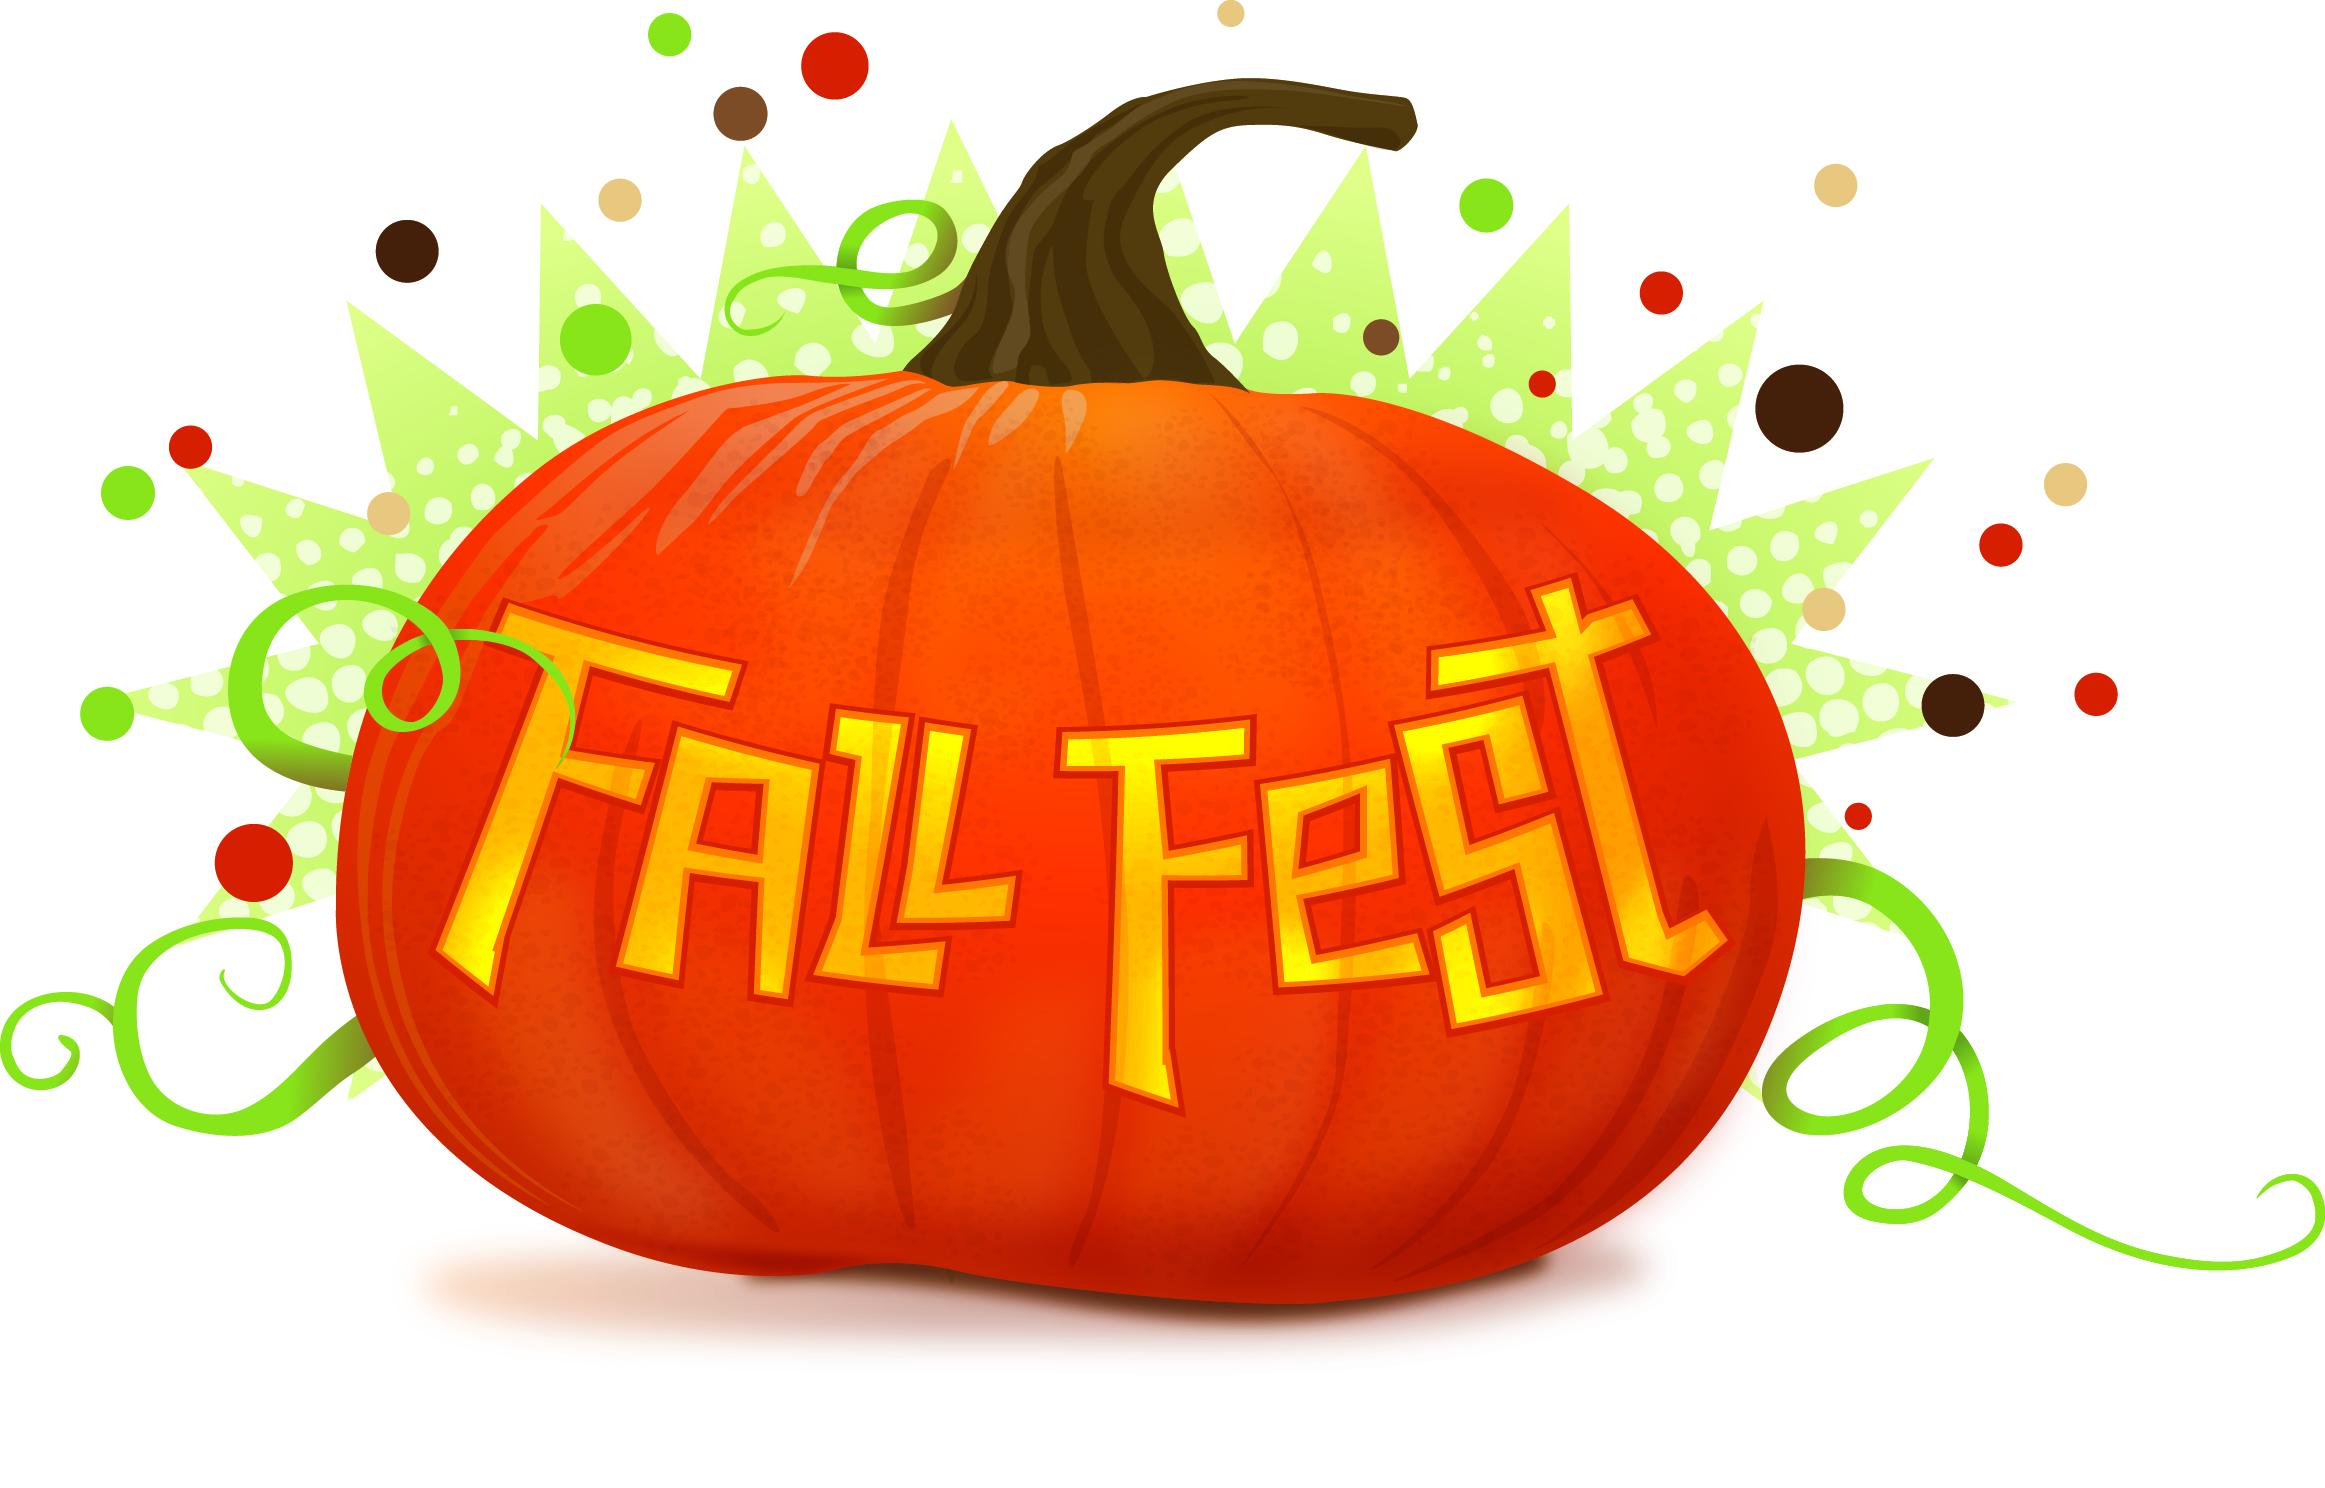 Fall festival clipart 6